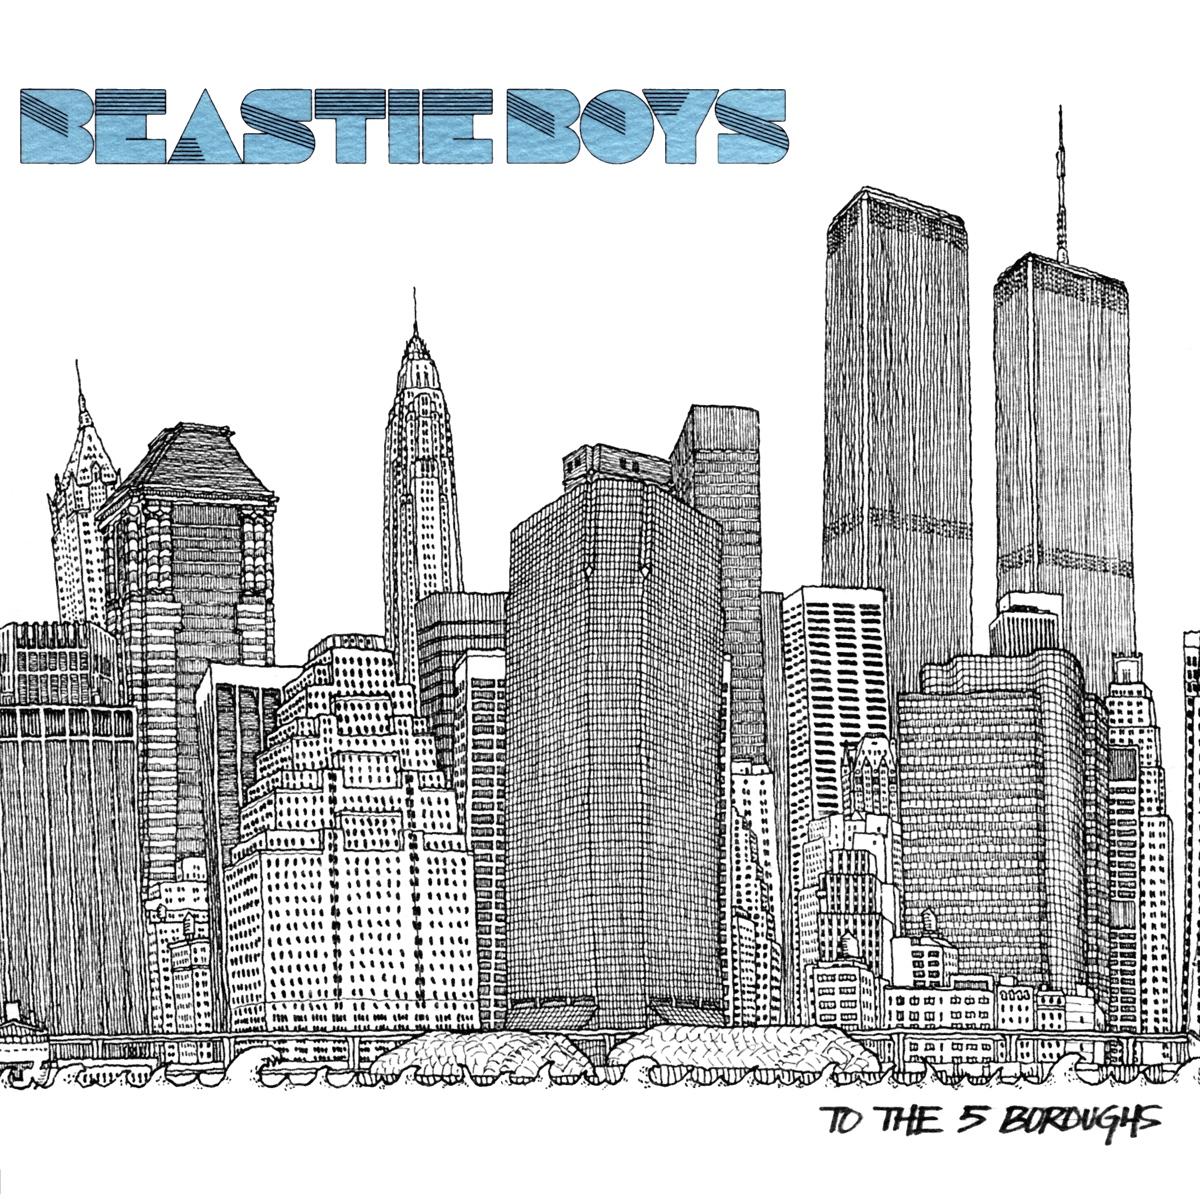 Beastie Boys, To The 5 Boroughs